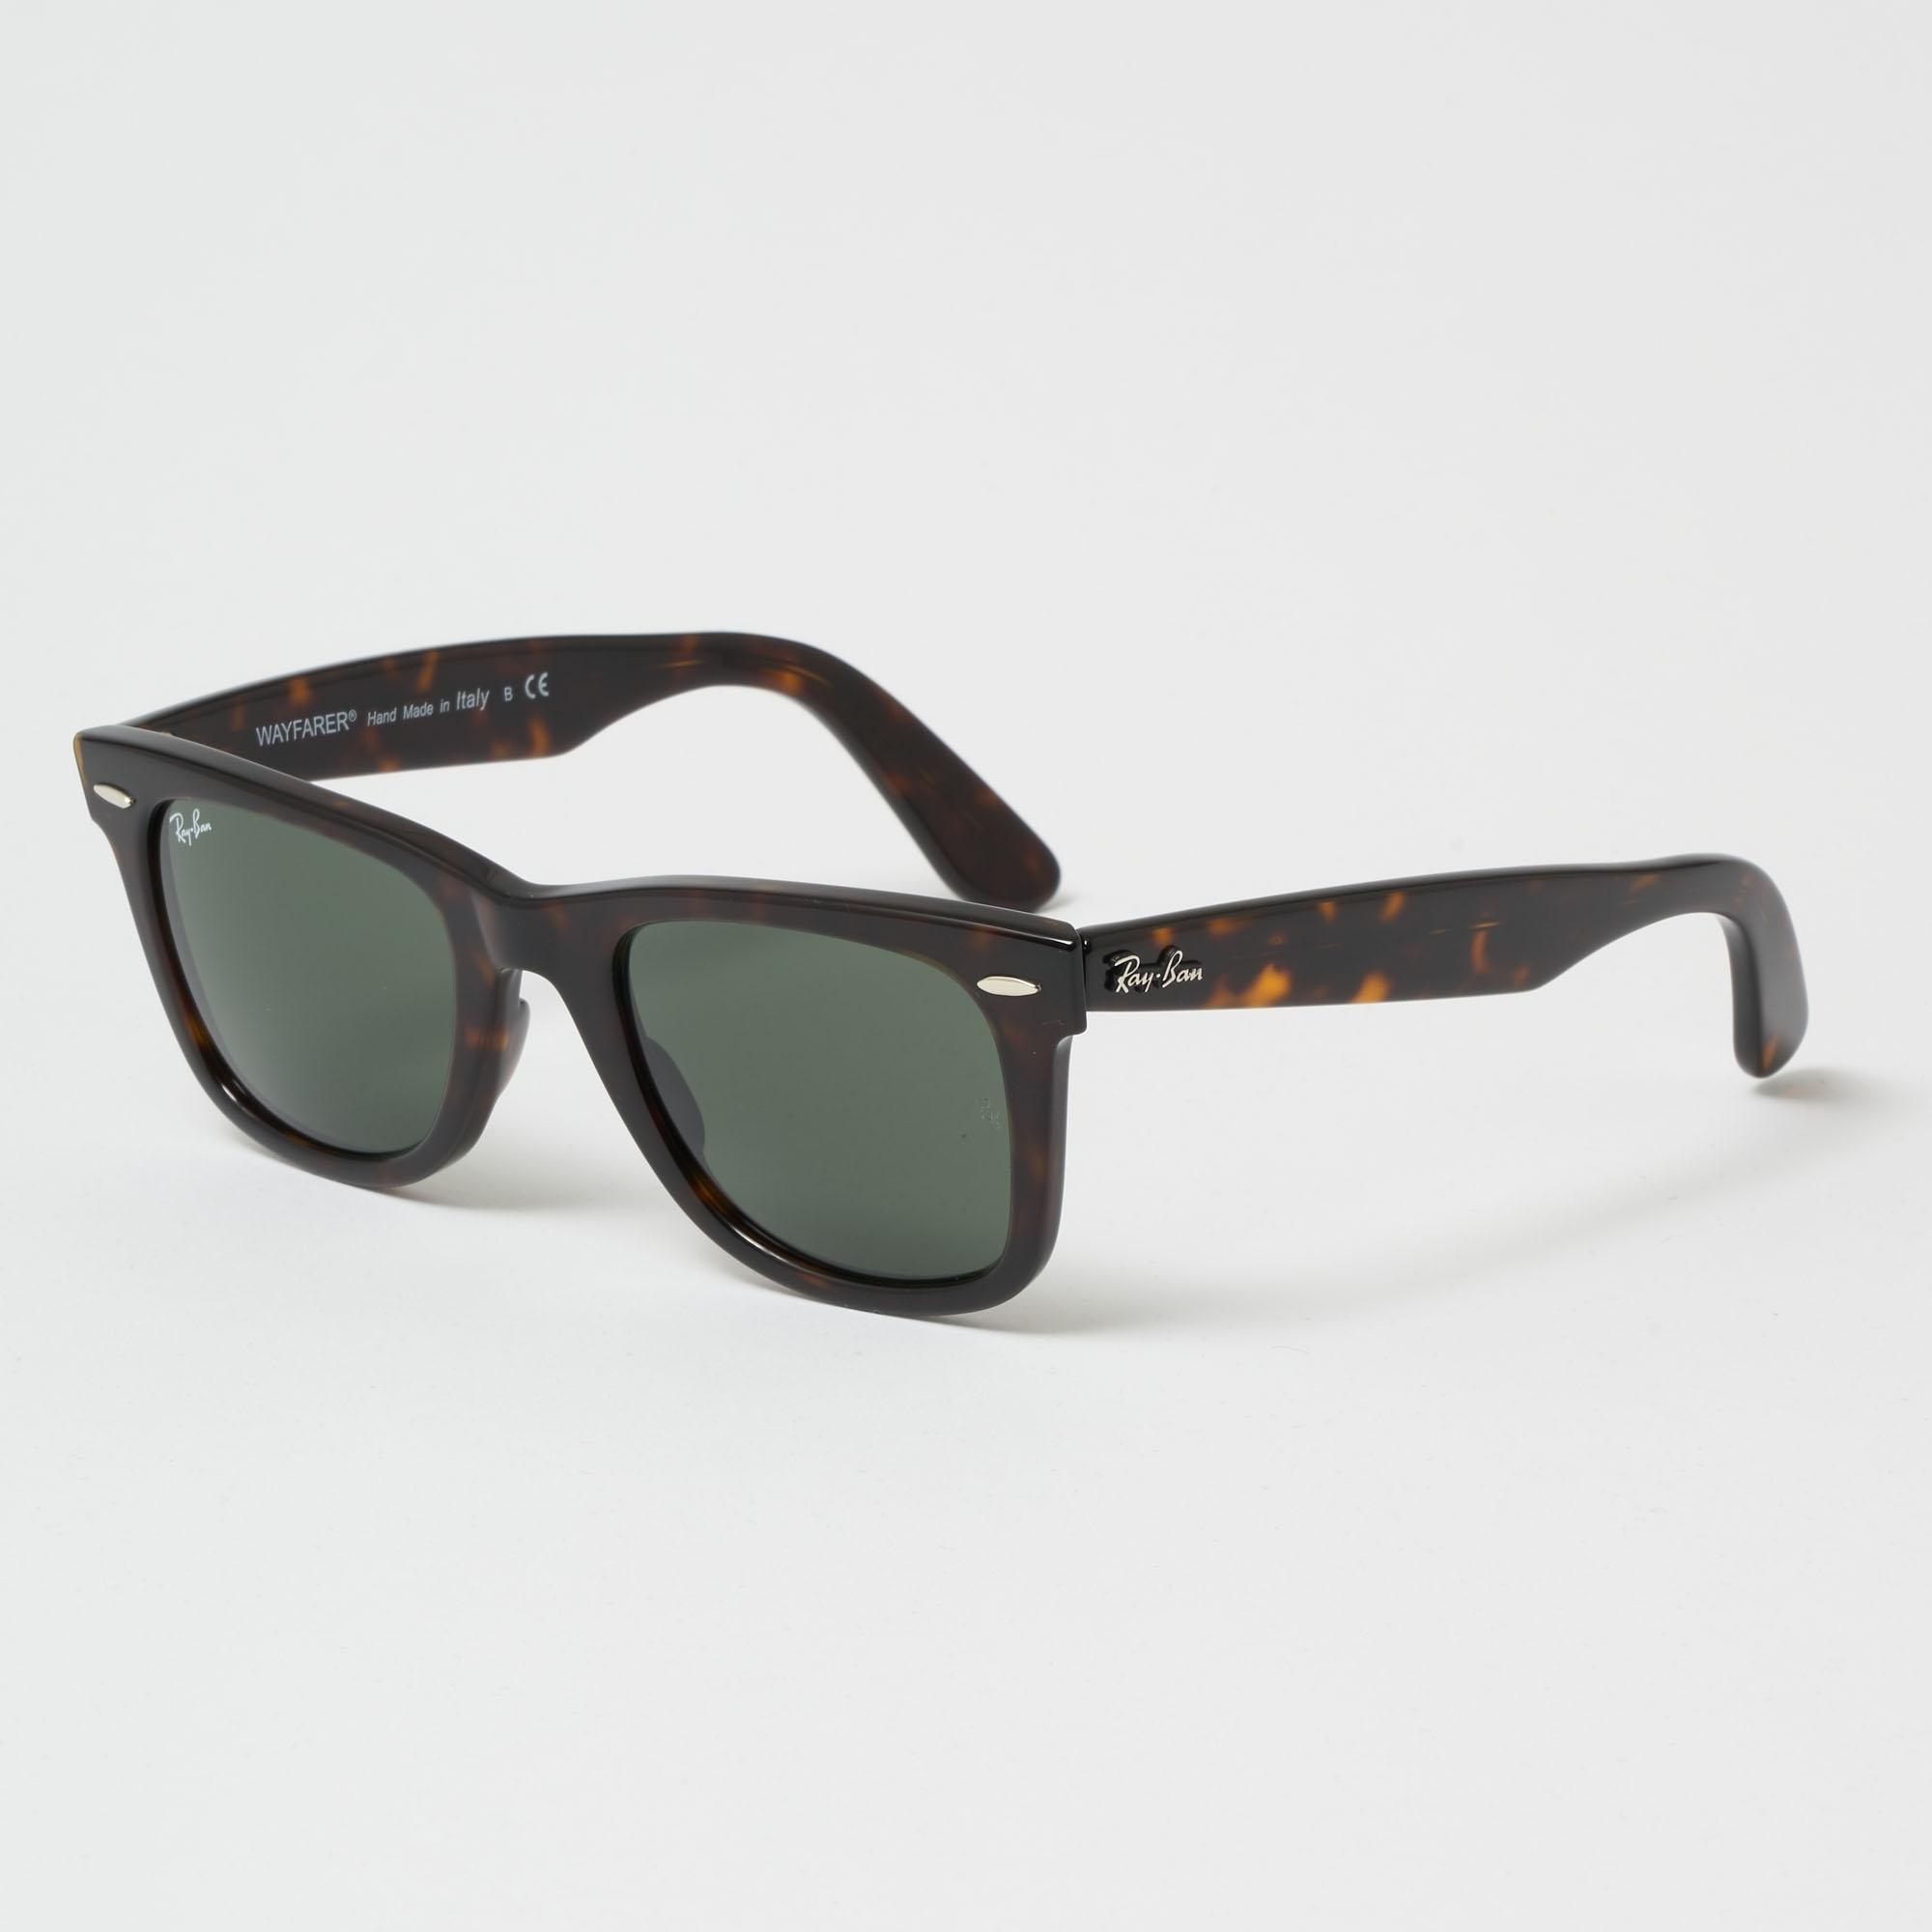 Tortoise Original Wayfarer Classic Sunglasses - Green Classic G-15 Lenses 0dce4e5875